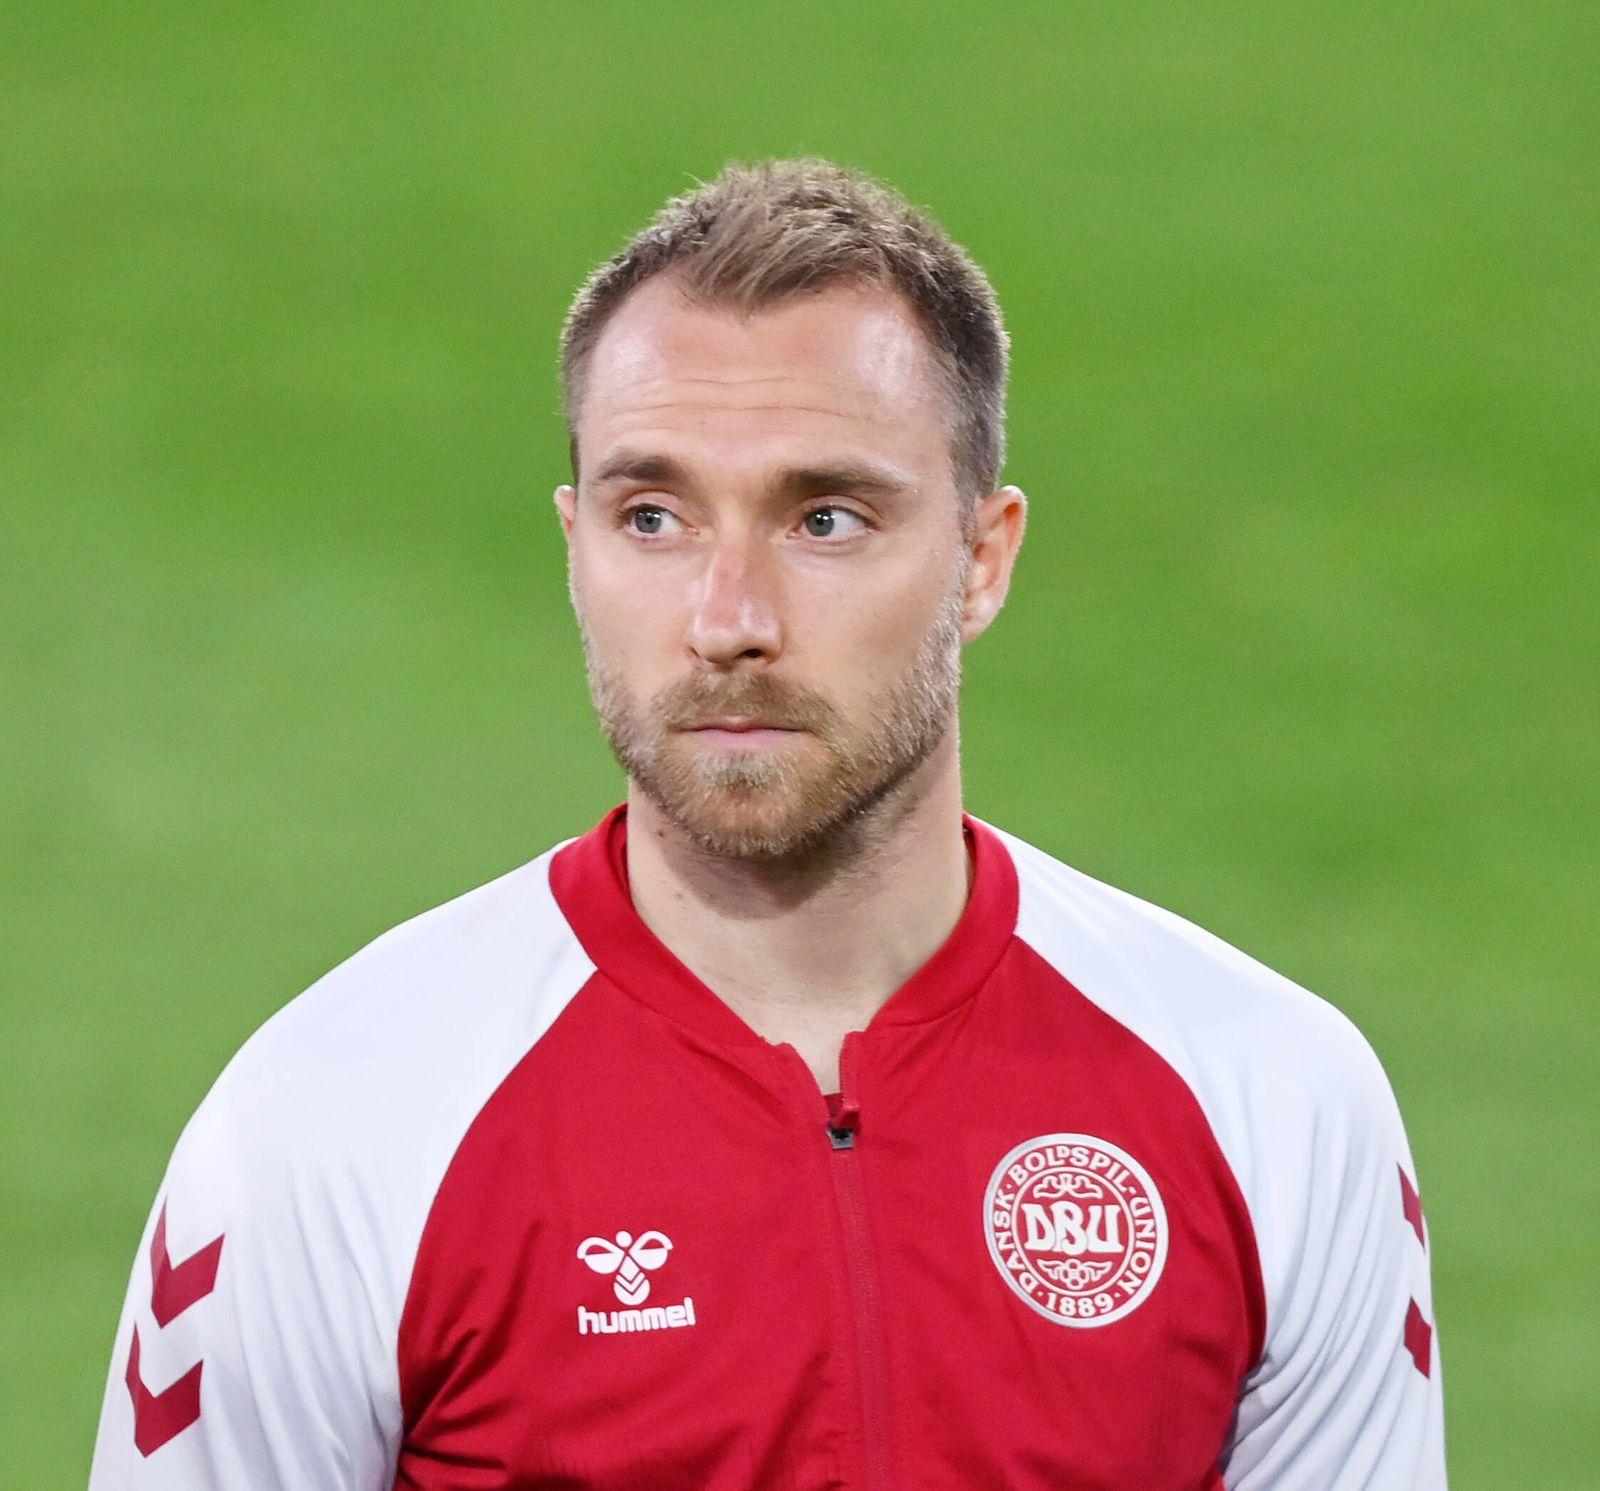 FUSSBALL INTERNATIONAL Testspiel EM 2021 in Innsbruck Deutschland - Daenemark 02.06.2021 Christian Eriksen (Daenemark) *